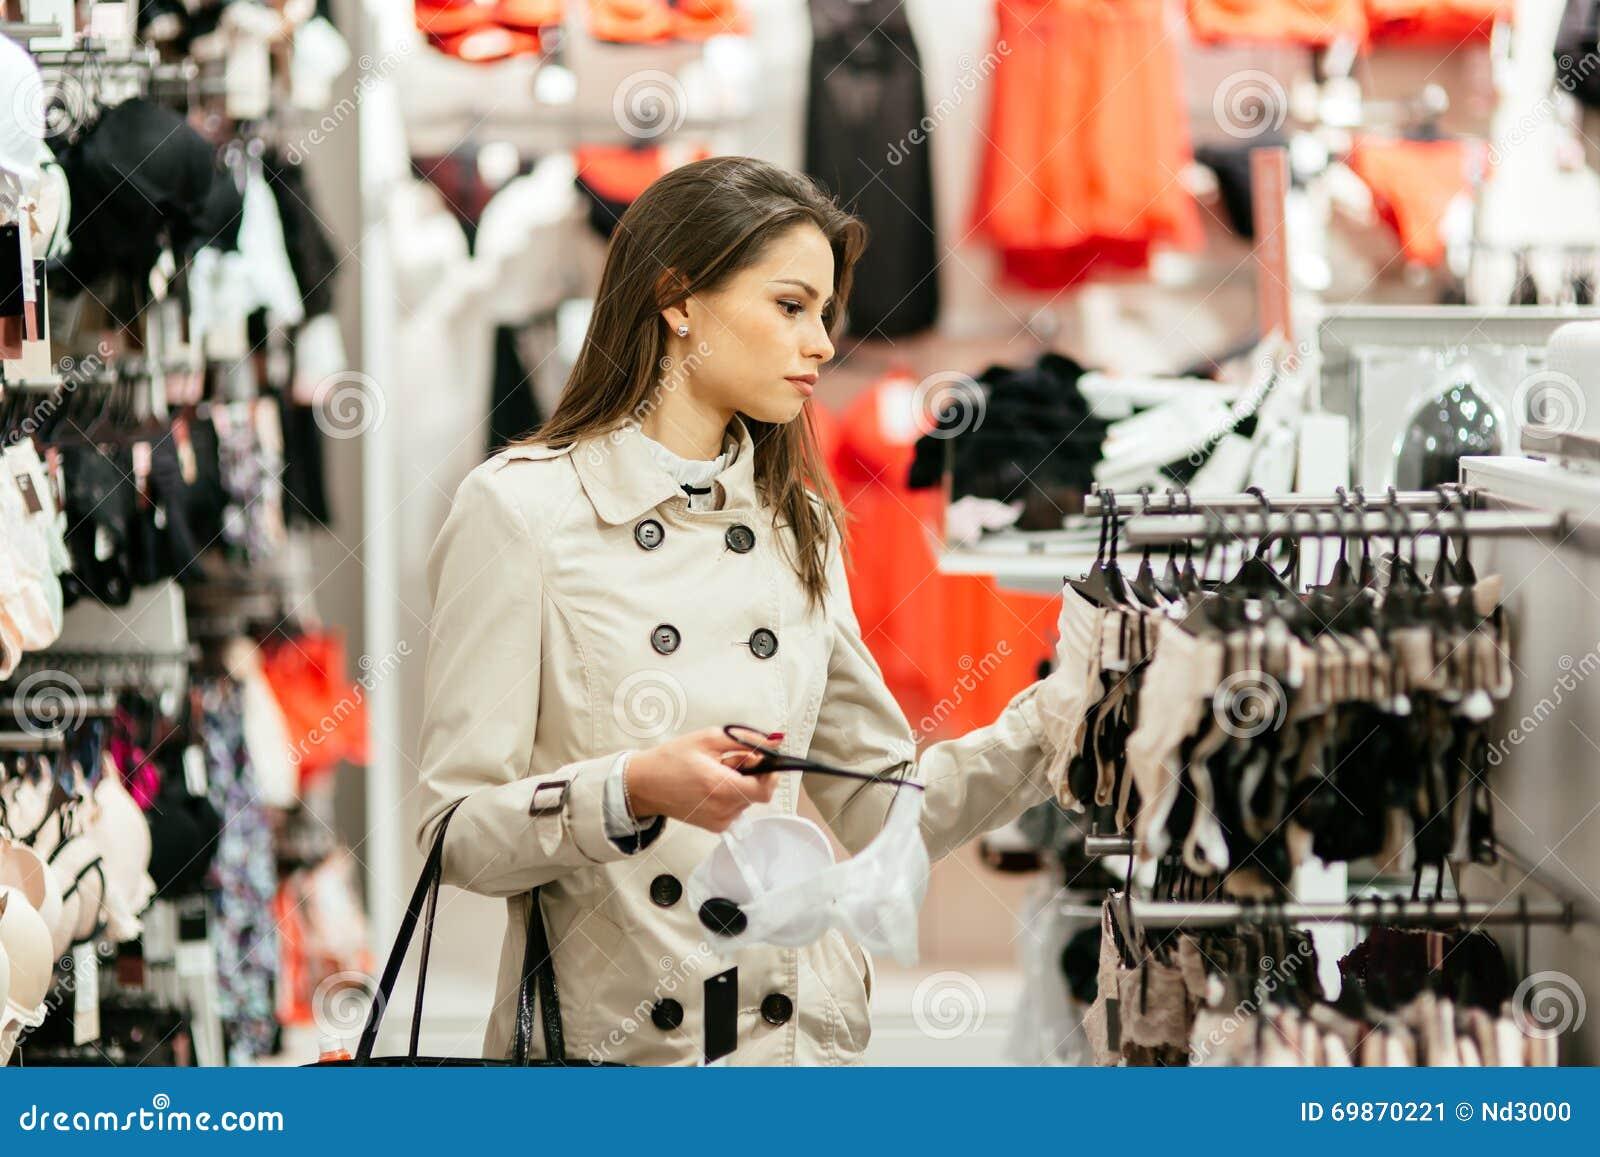 Beautiful Woman Shopping Lingerie Stock Photo - Image: 69870221